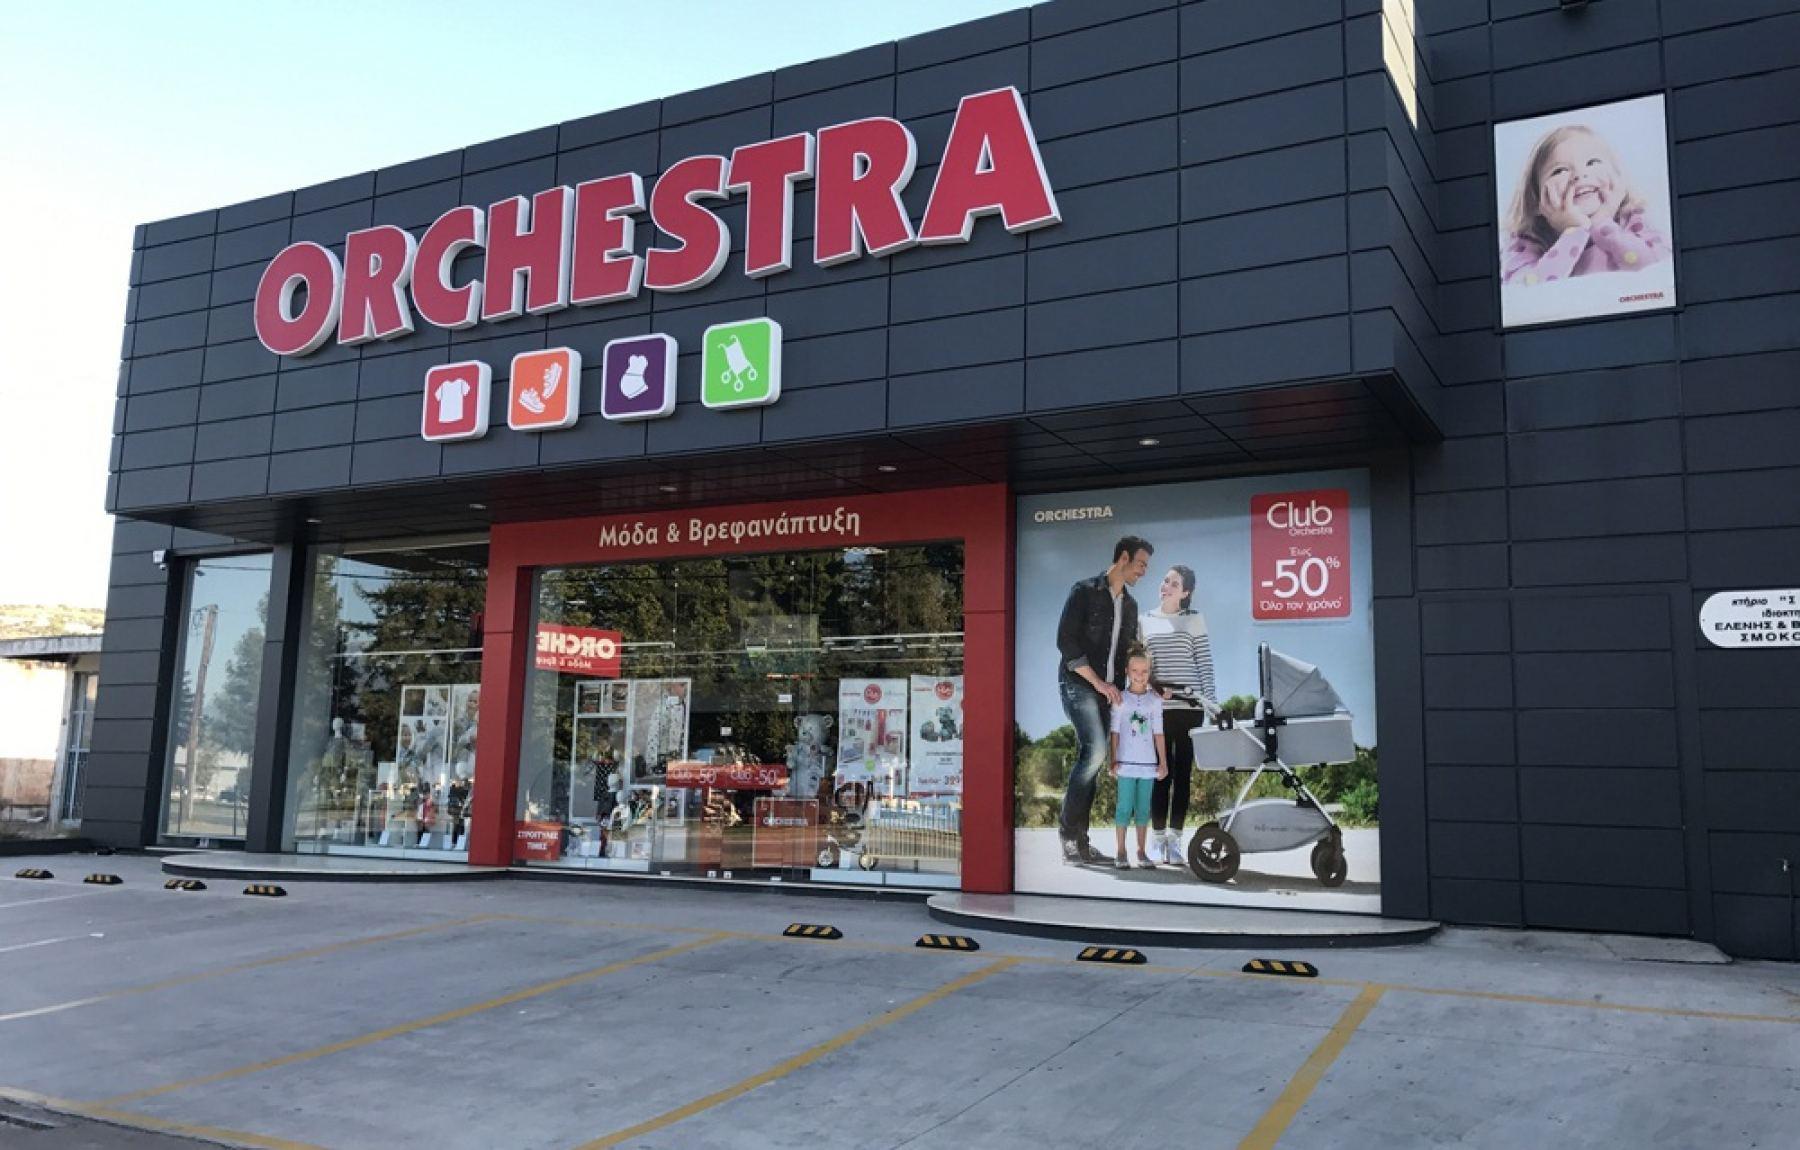 24cb57cd40b Στο κατάστημα Orchestra (Γ. Γεννηματά 11) στη Λαμία, θα βρείτε βρεφικά  είδη, είδη εγκυμοσύνης και παιδικής μόδας από τη γέννηση έως και 14 χρονών,  ...